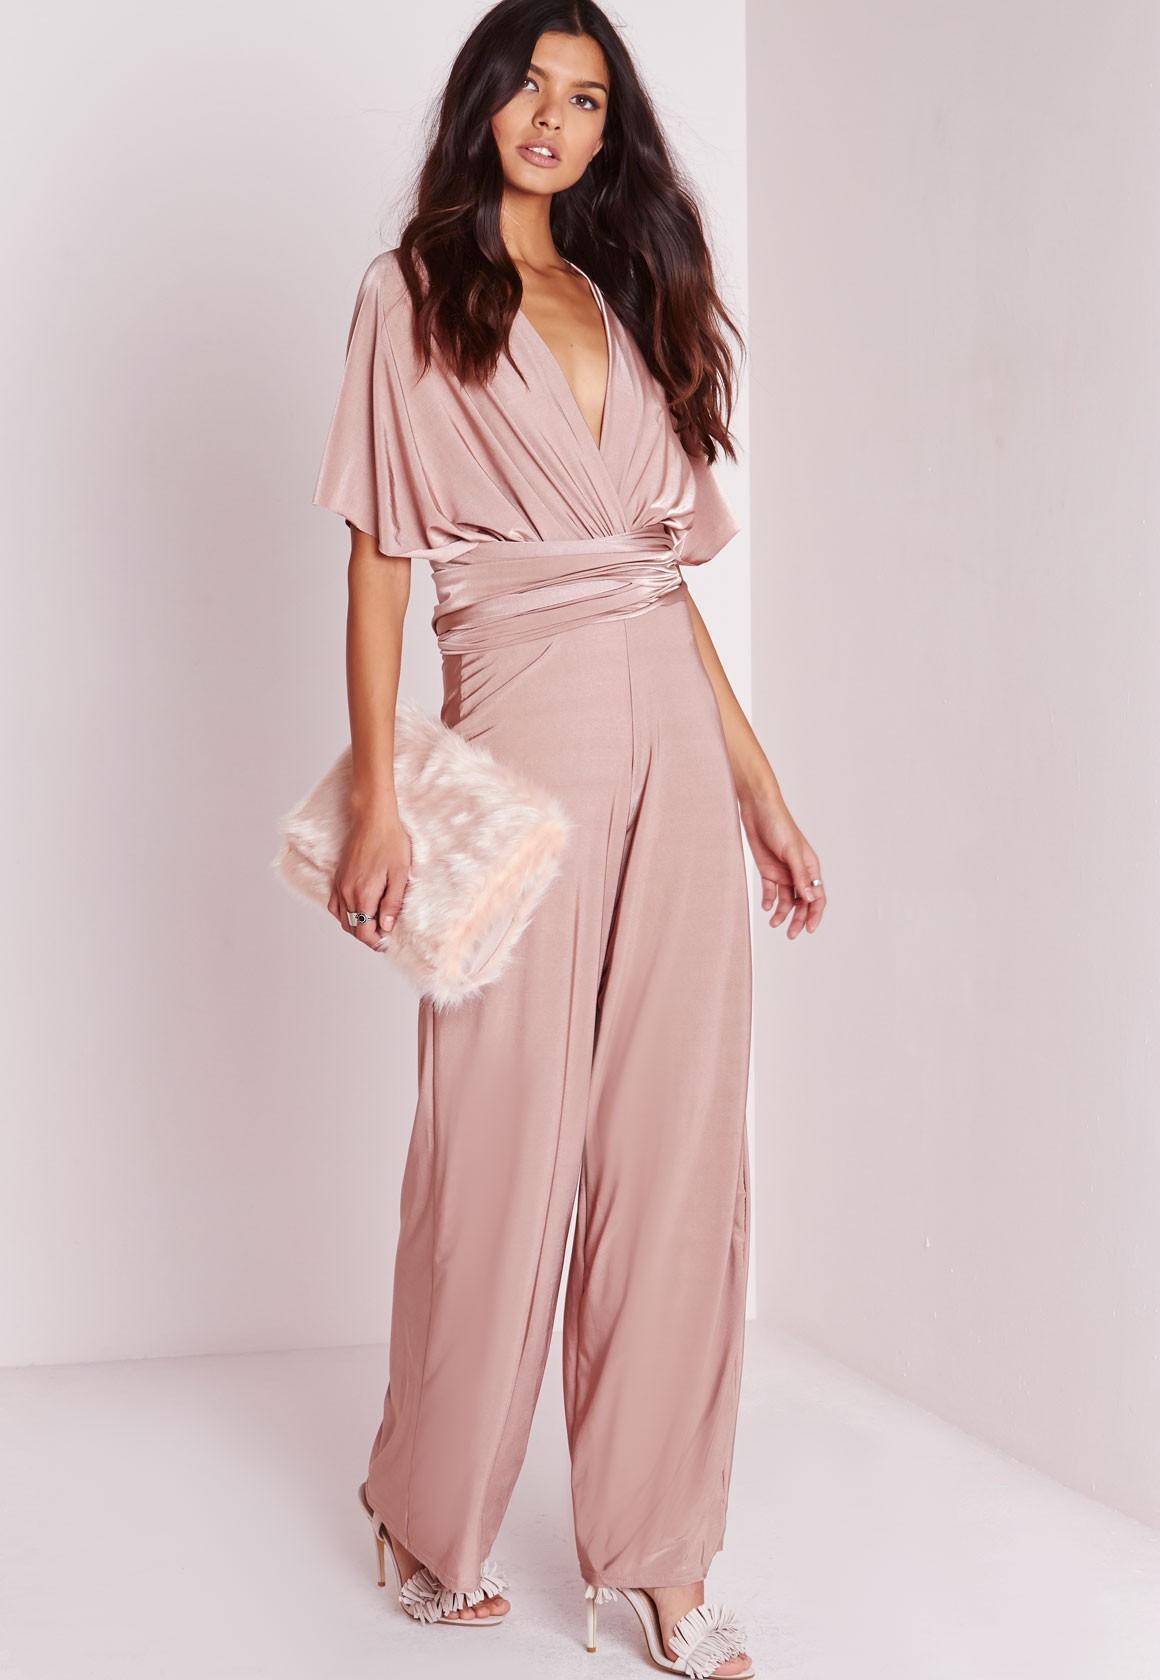 pink-light-jumpsuit-pink-bag-clutch-white-shoe-sandalh-howtowear-spring-summer-brun-dinner.jpg